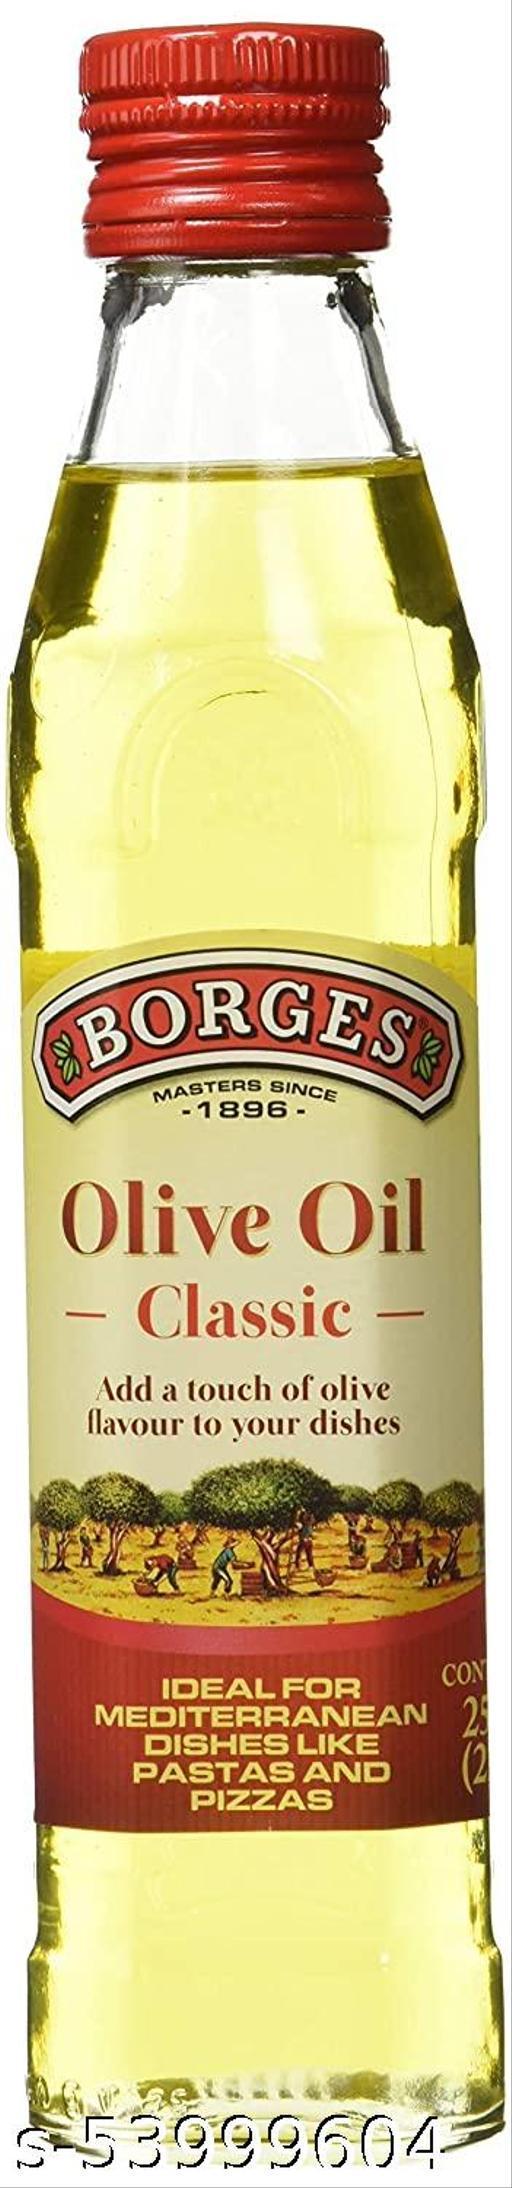 Pure Olive Oil Glass, 250ml